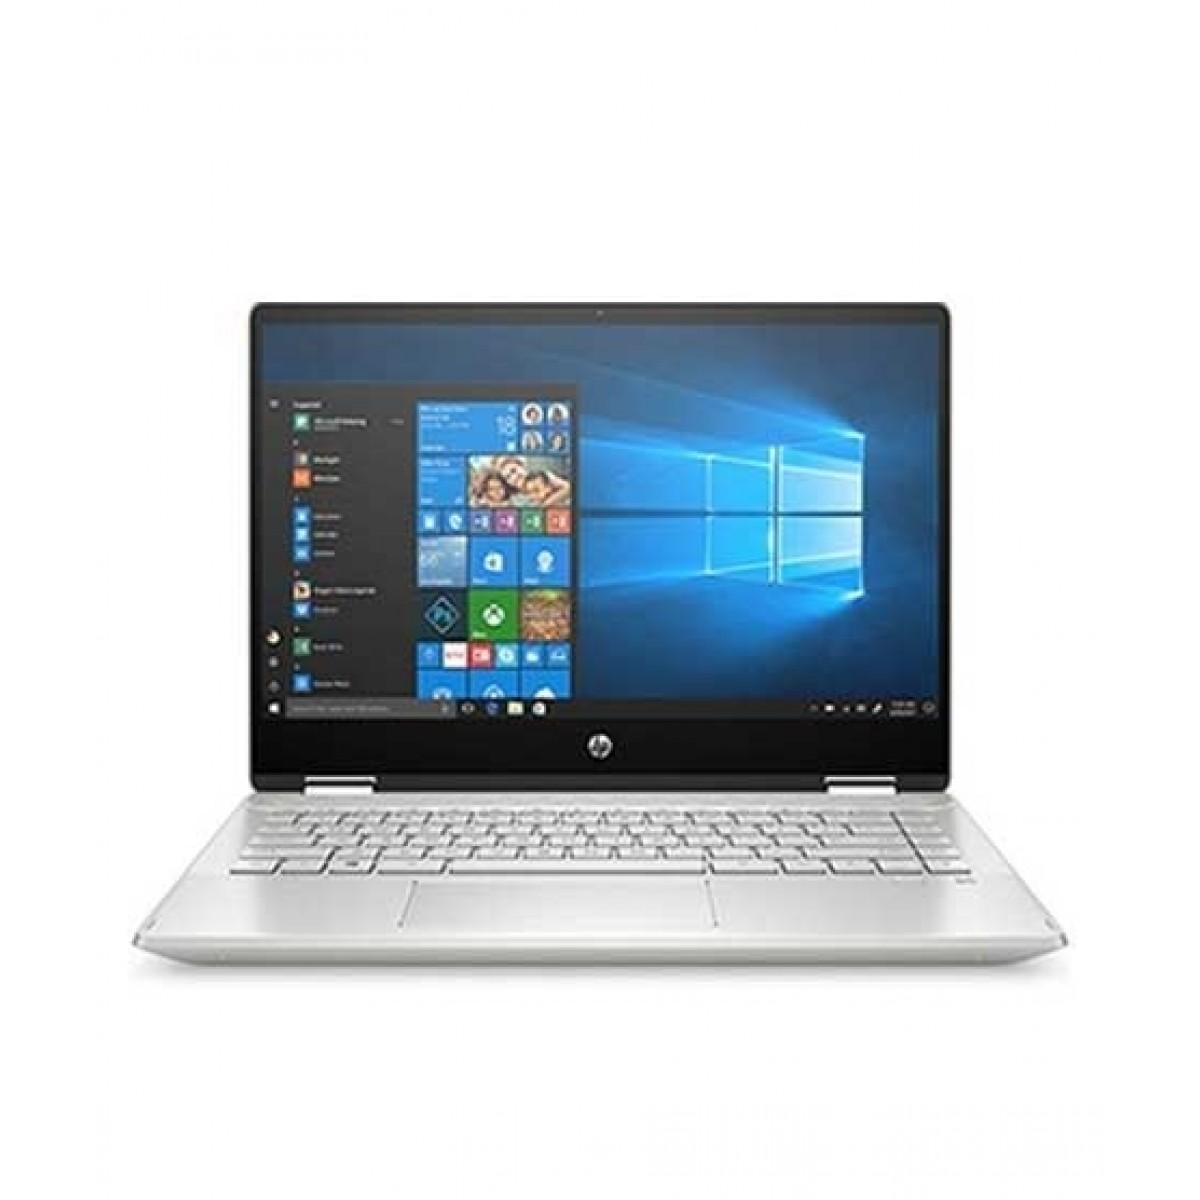 Hp Pavilion X360 14 Core I5 10th Gen Touch Laptop 14 Dh1004tu Price In Pakistan Buy Hp Pavilion X360 4gb 1tb Touch Laptop 14 Dh1004tu Ishopping Pk